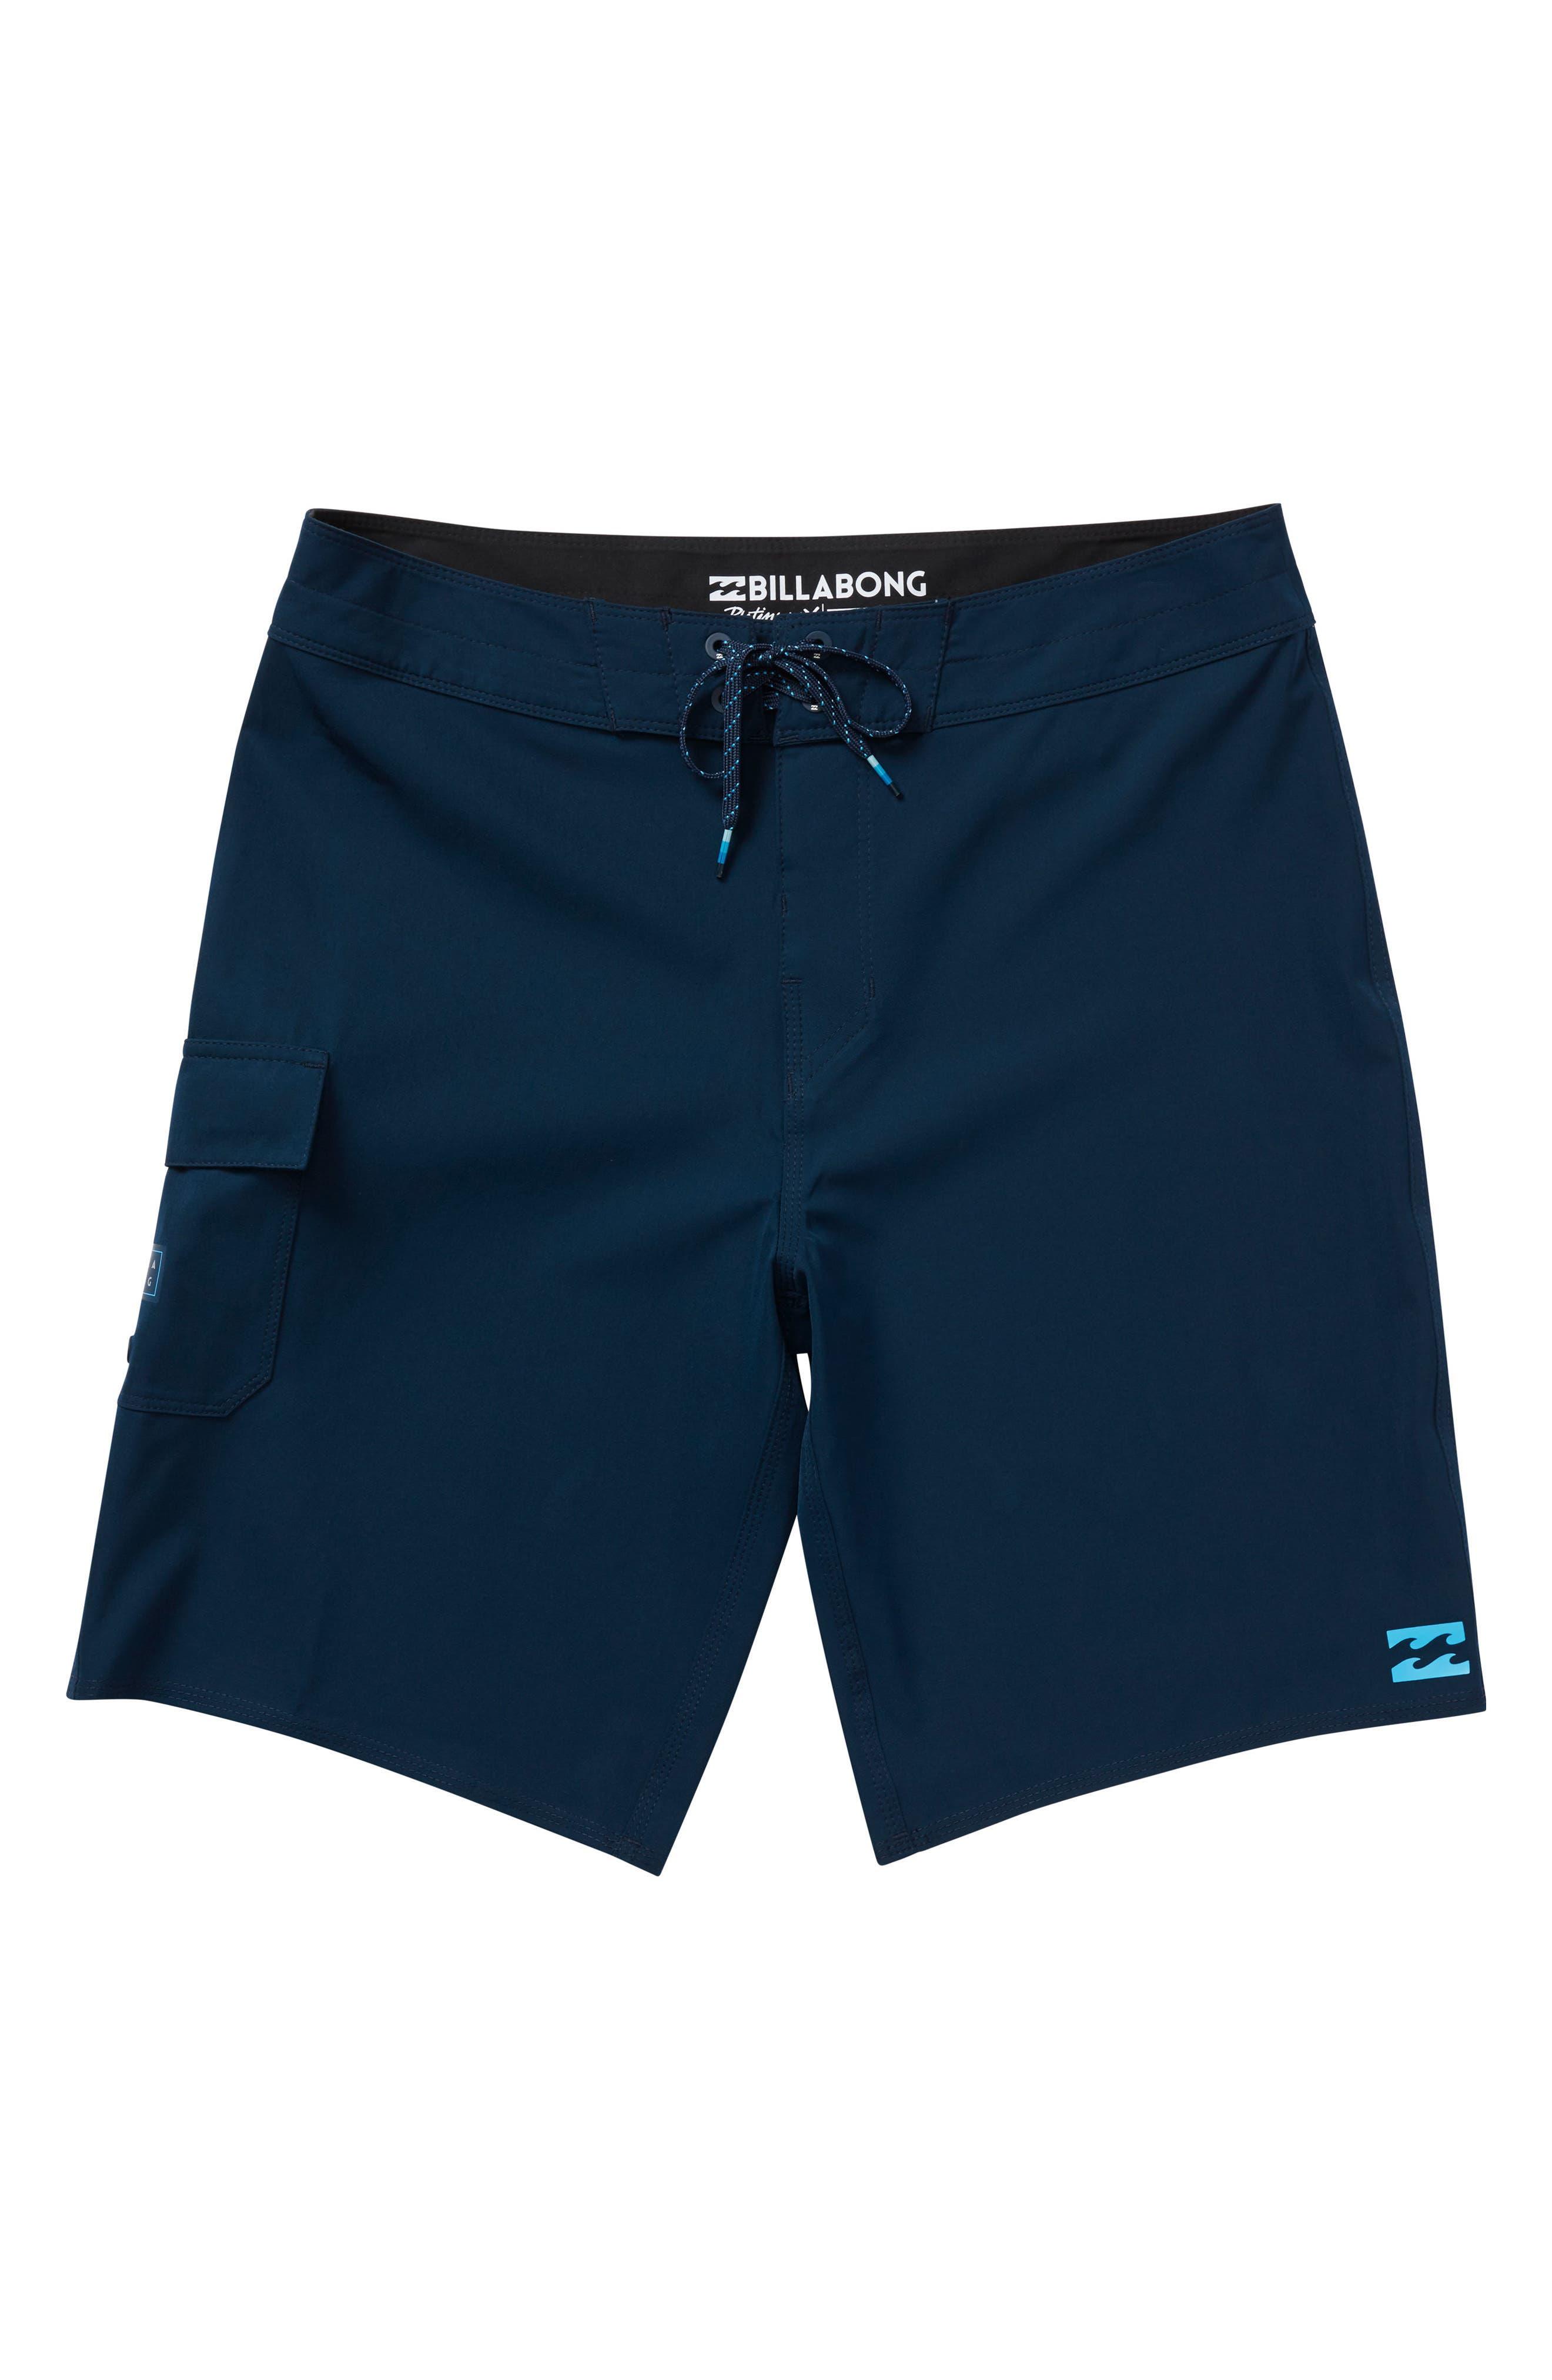 Billabong All Day X Board Shorts (Big Boys)